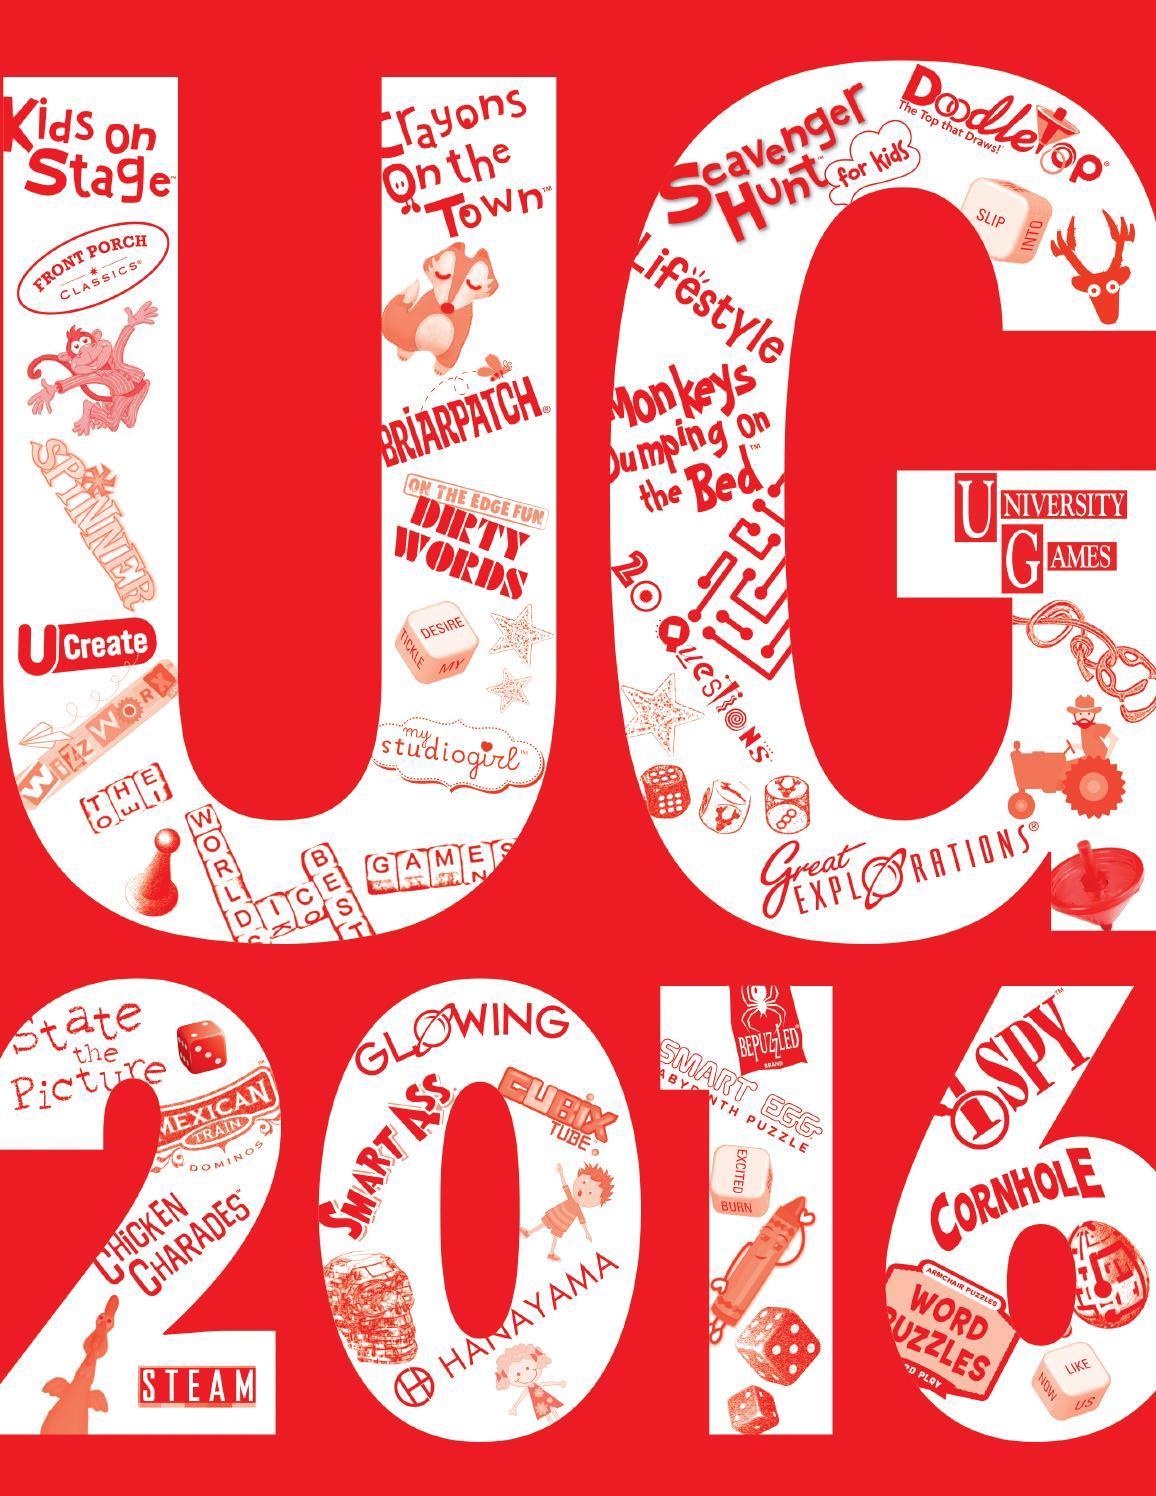 University Games 2016 Catalog by University Games - issuu